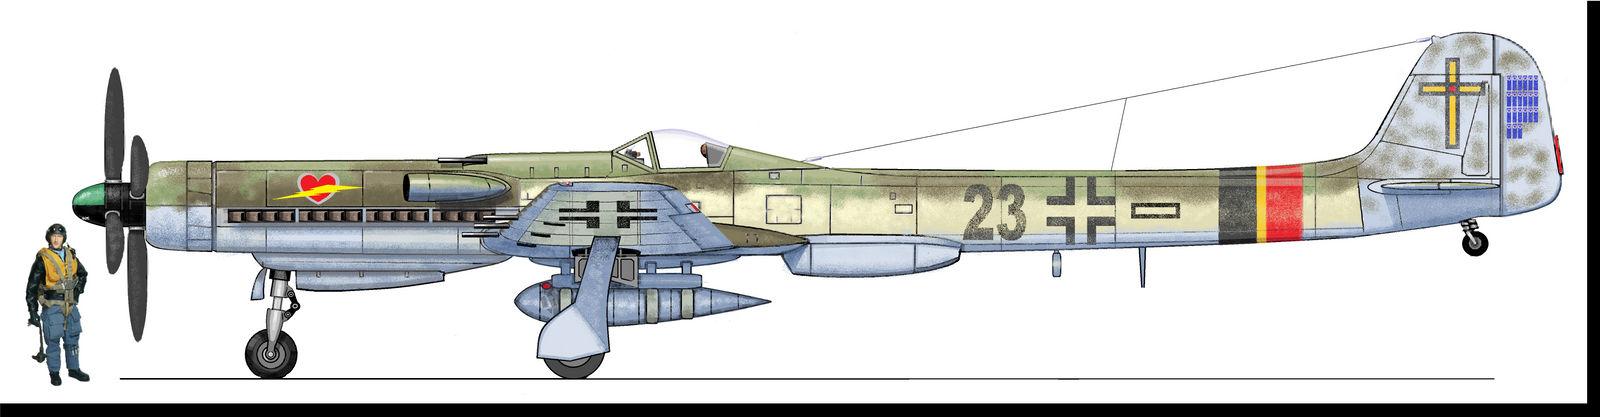 Veeblefitzer - Tank Ve-Ta 252 D  'Lost Angel'